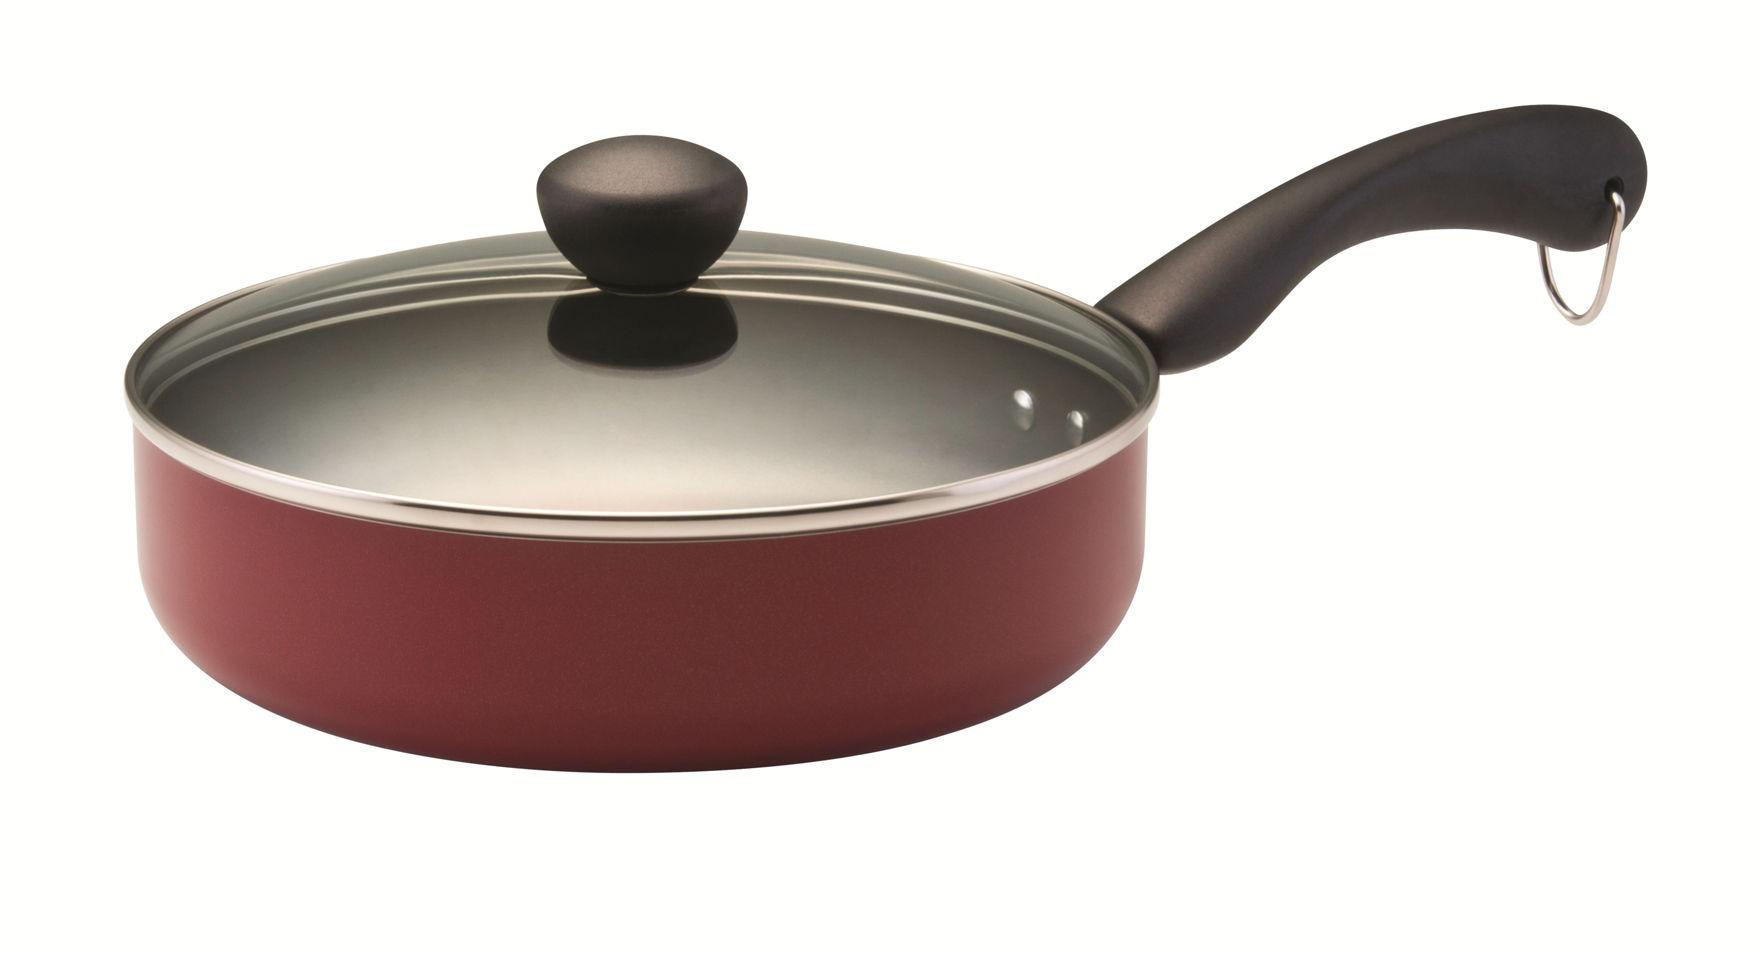 Farberware Red Pots & Dutch Ovens Cookware